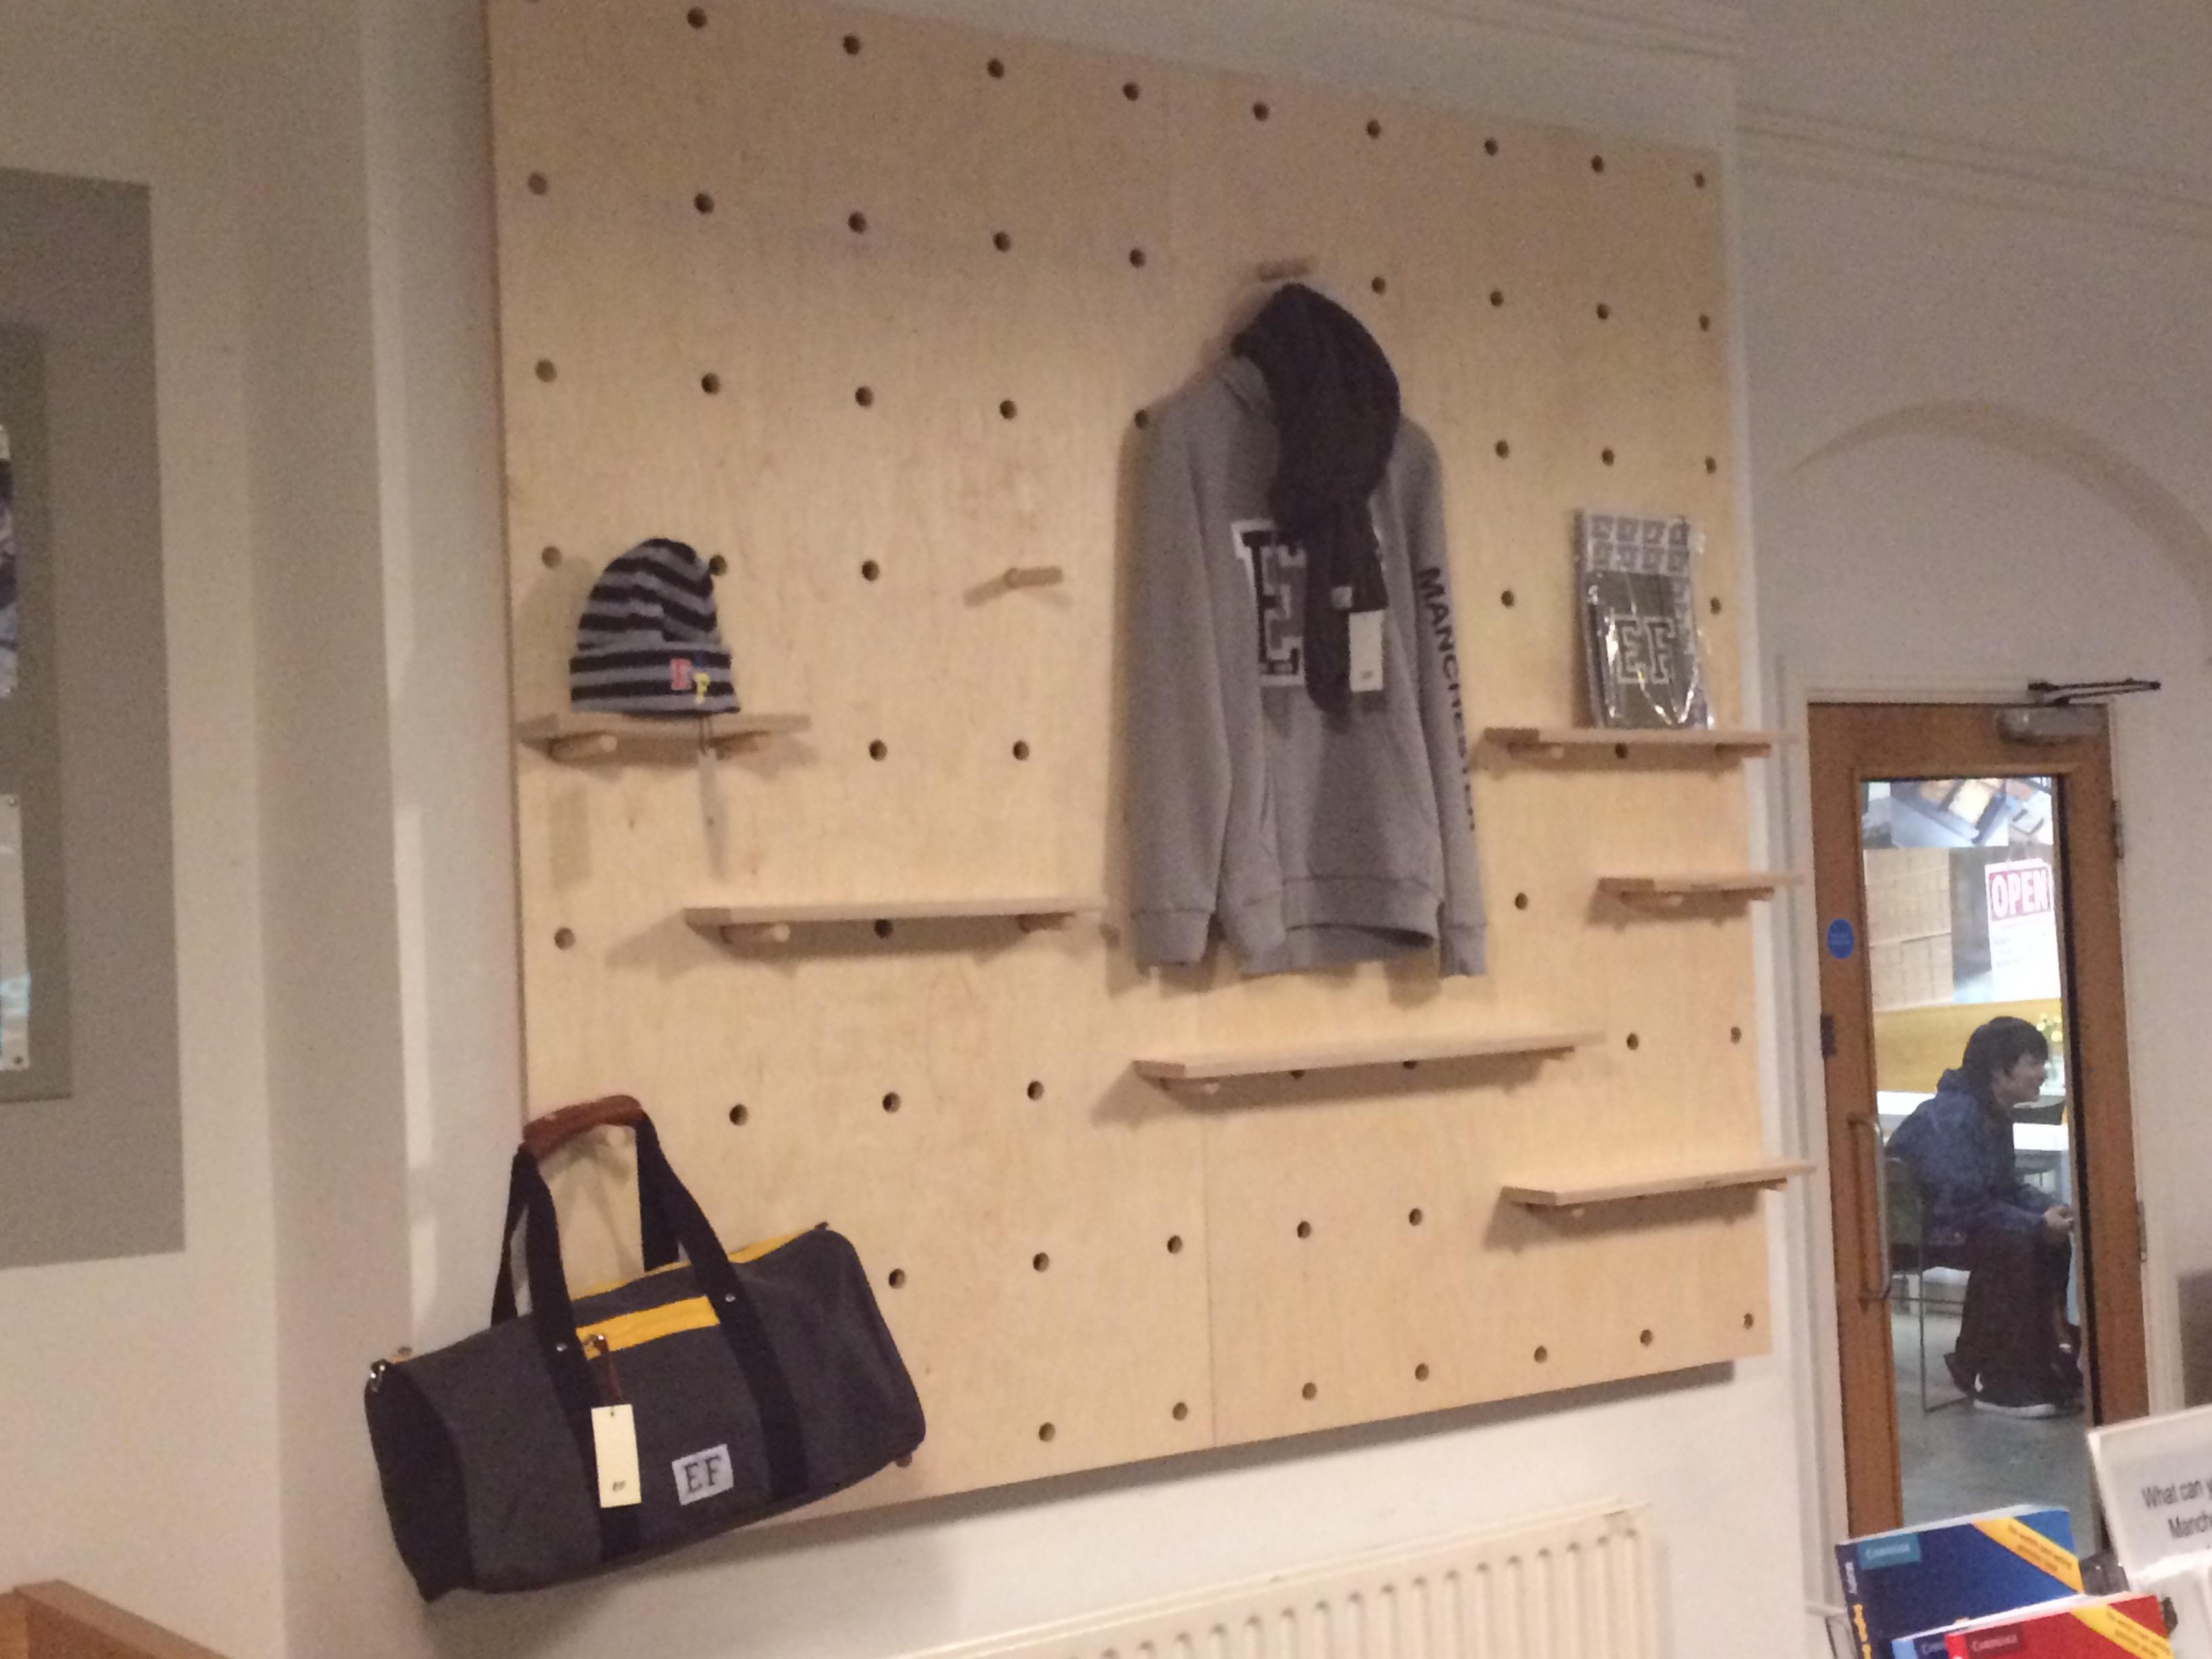 Display unit for merchandise